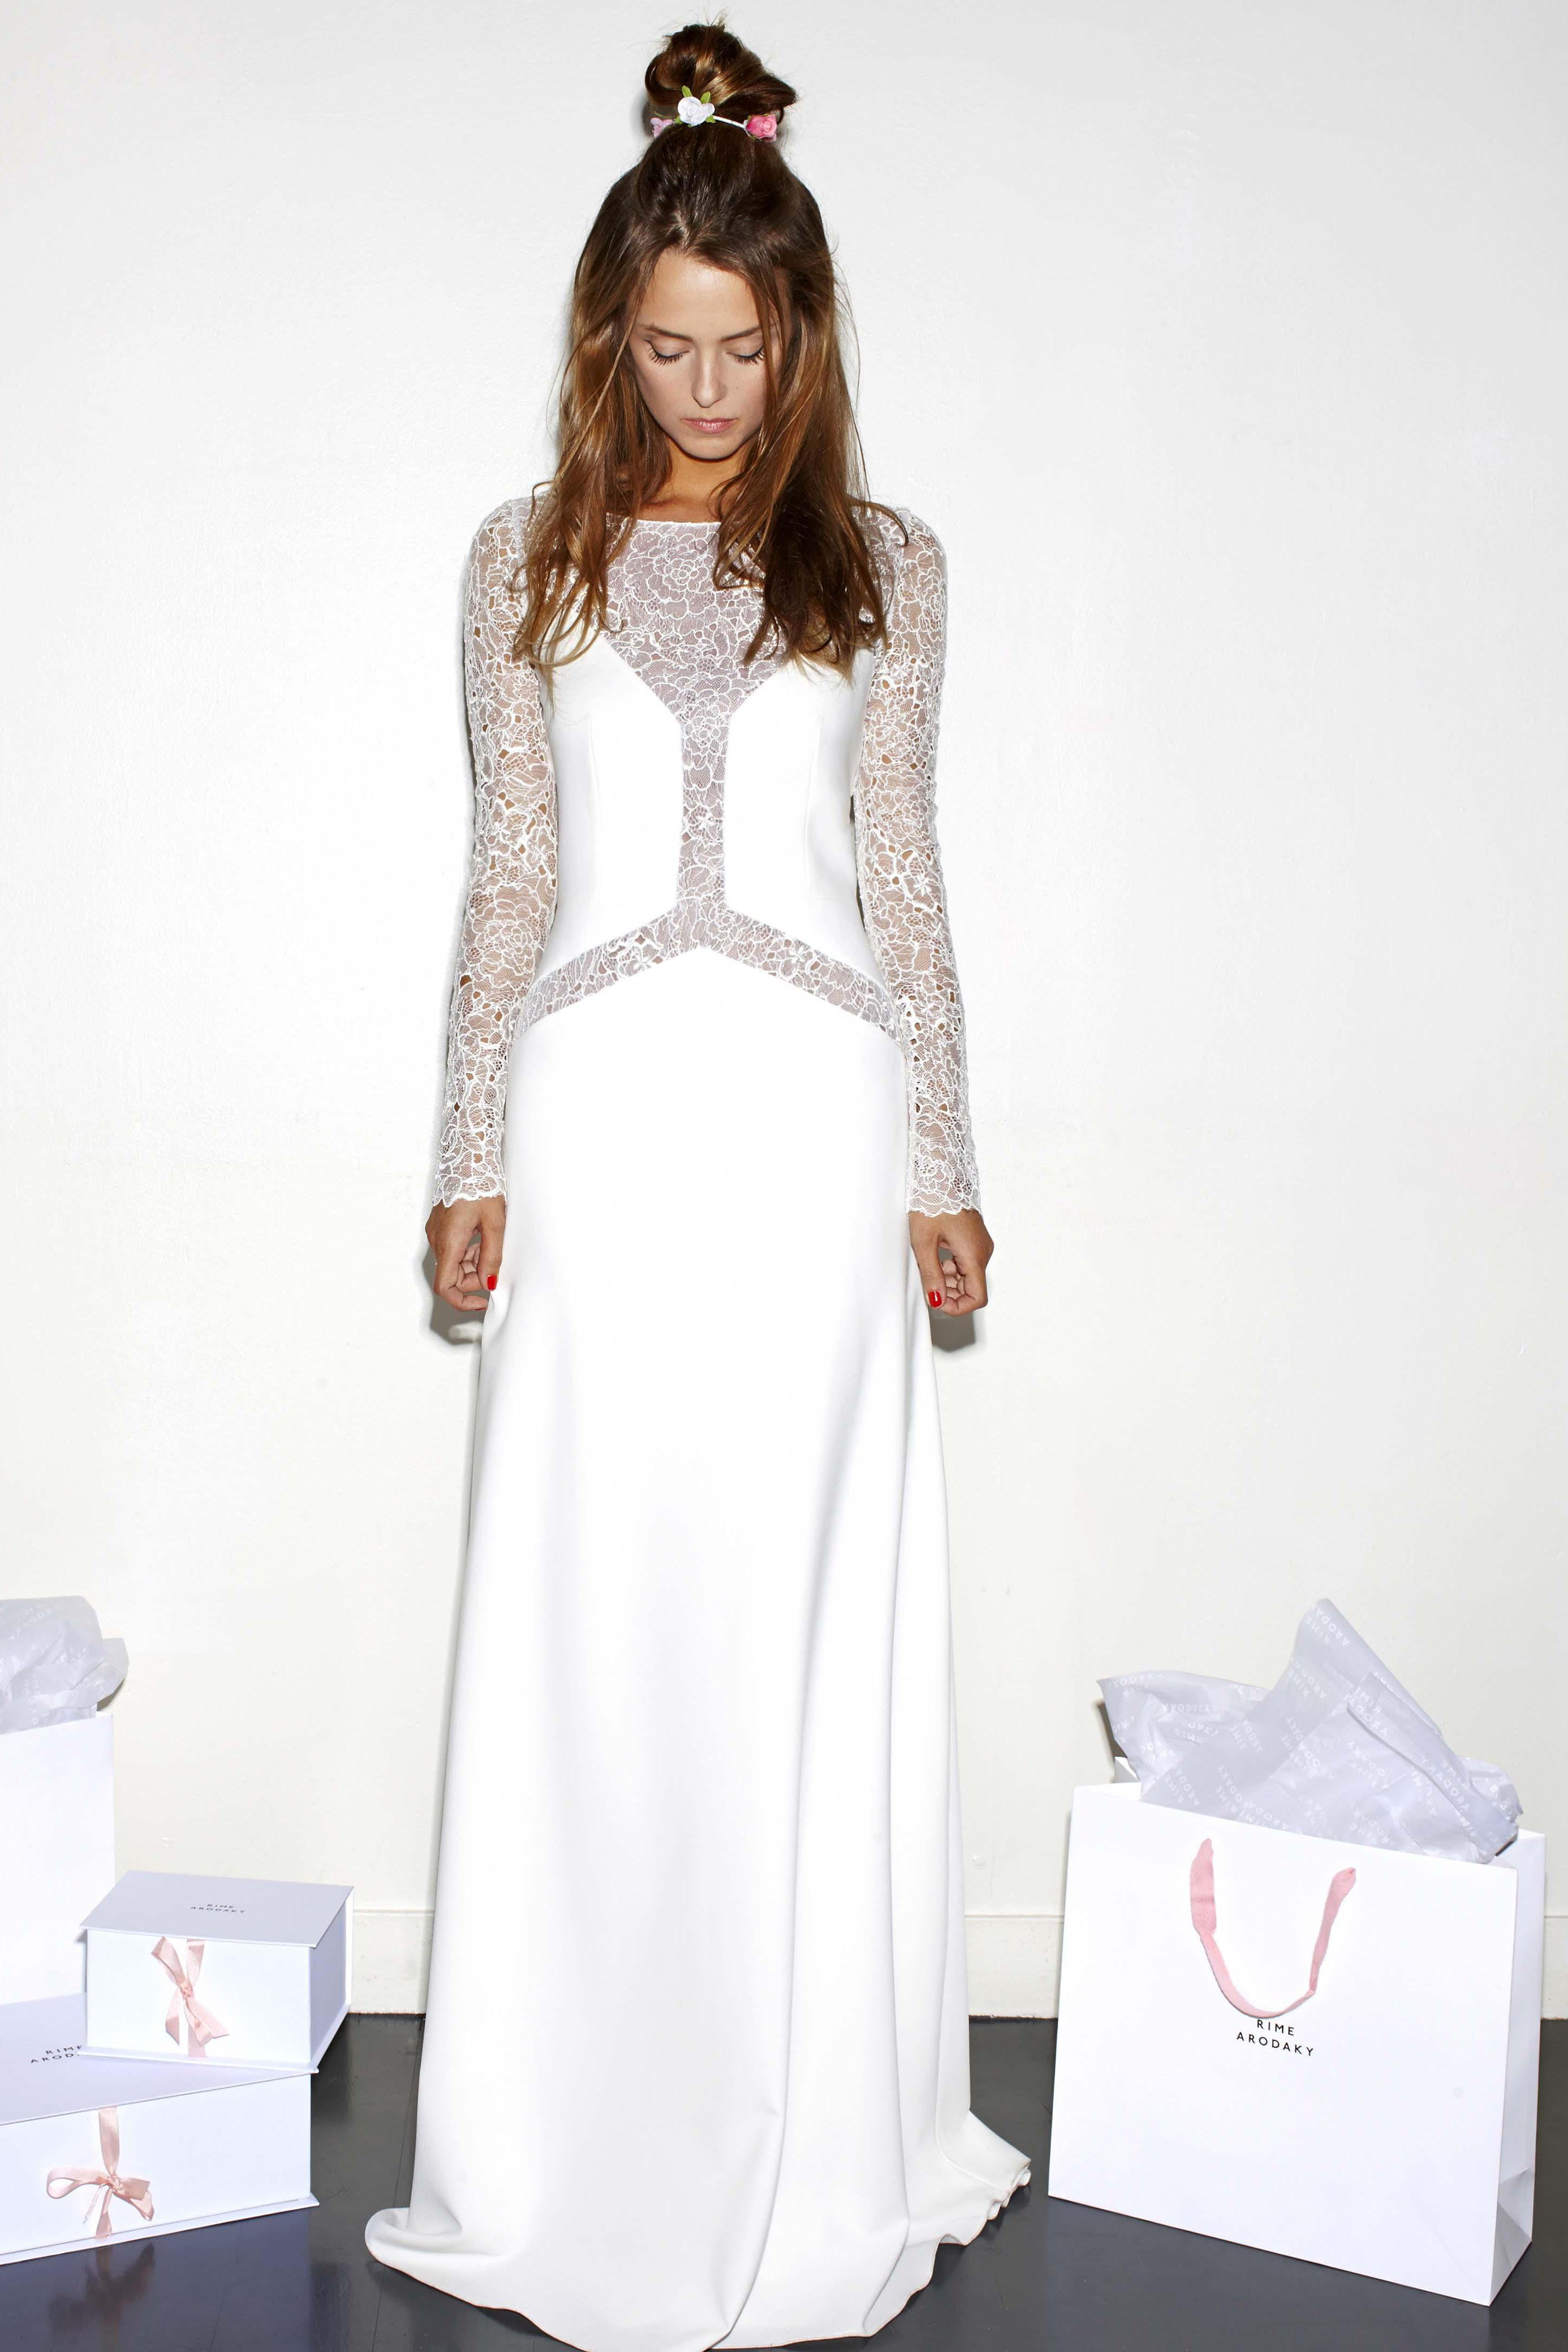 Mod le miller rime arodaky for Prix de robe de mariage en or georges chakra